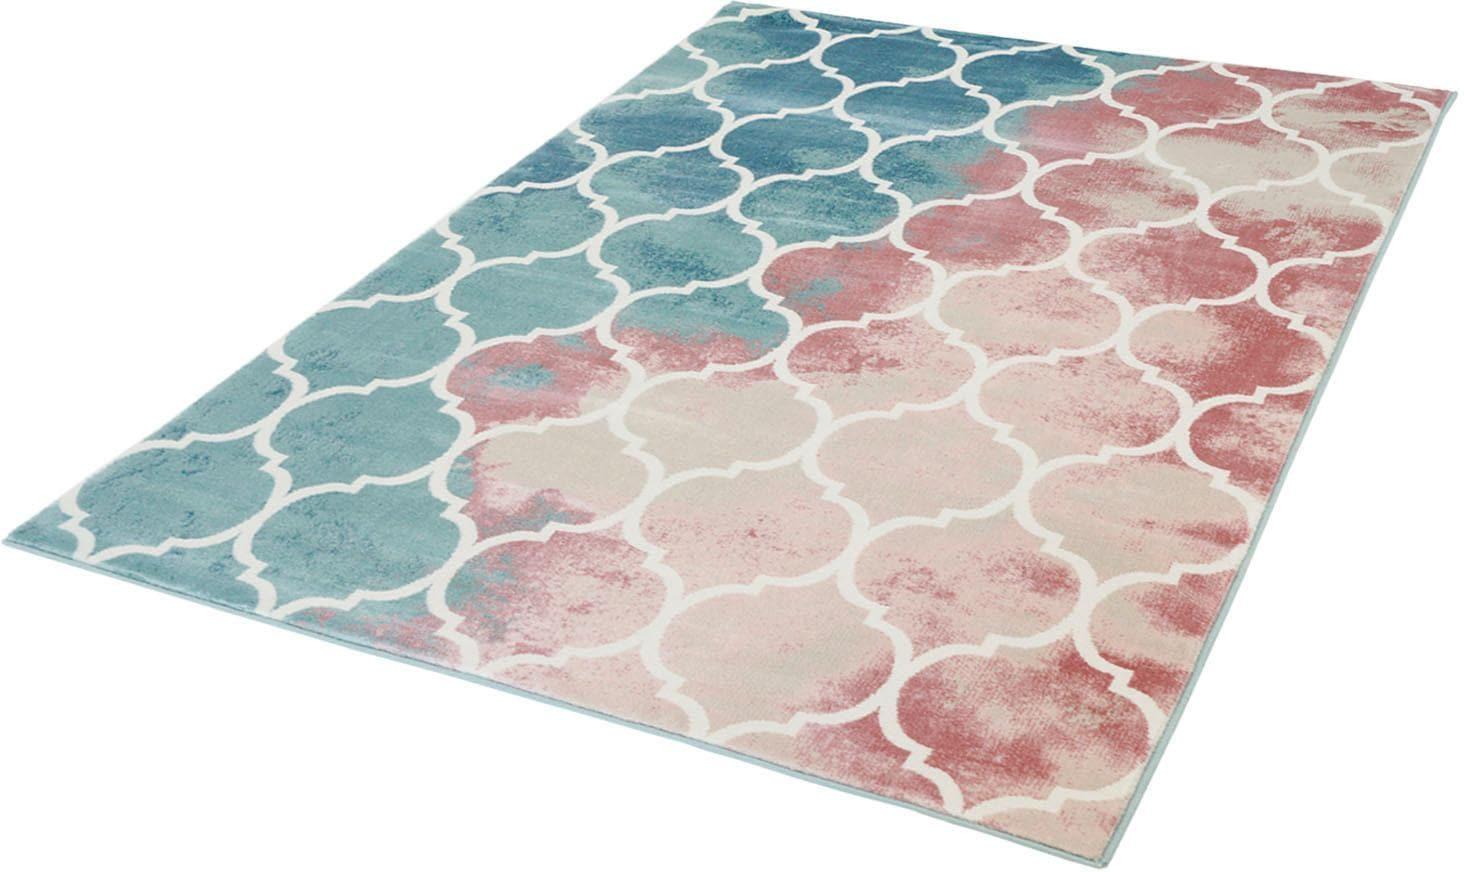 Teppich Inspiration 5796 Carpet City rechteckig Höhe 11 mm maschinell zusammengesetzt